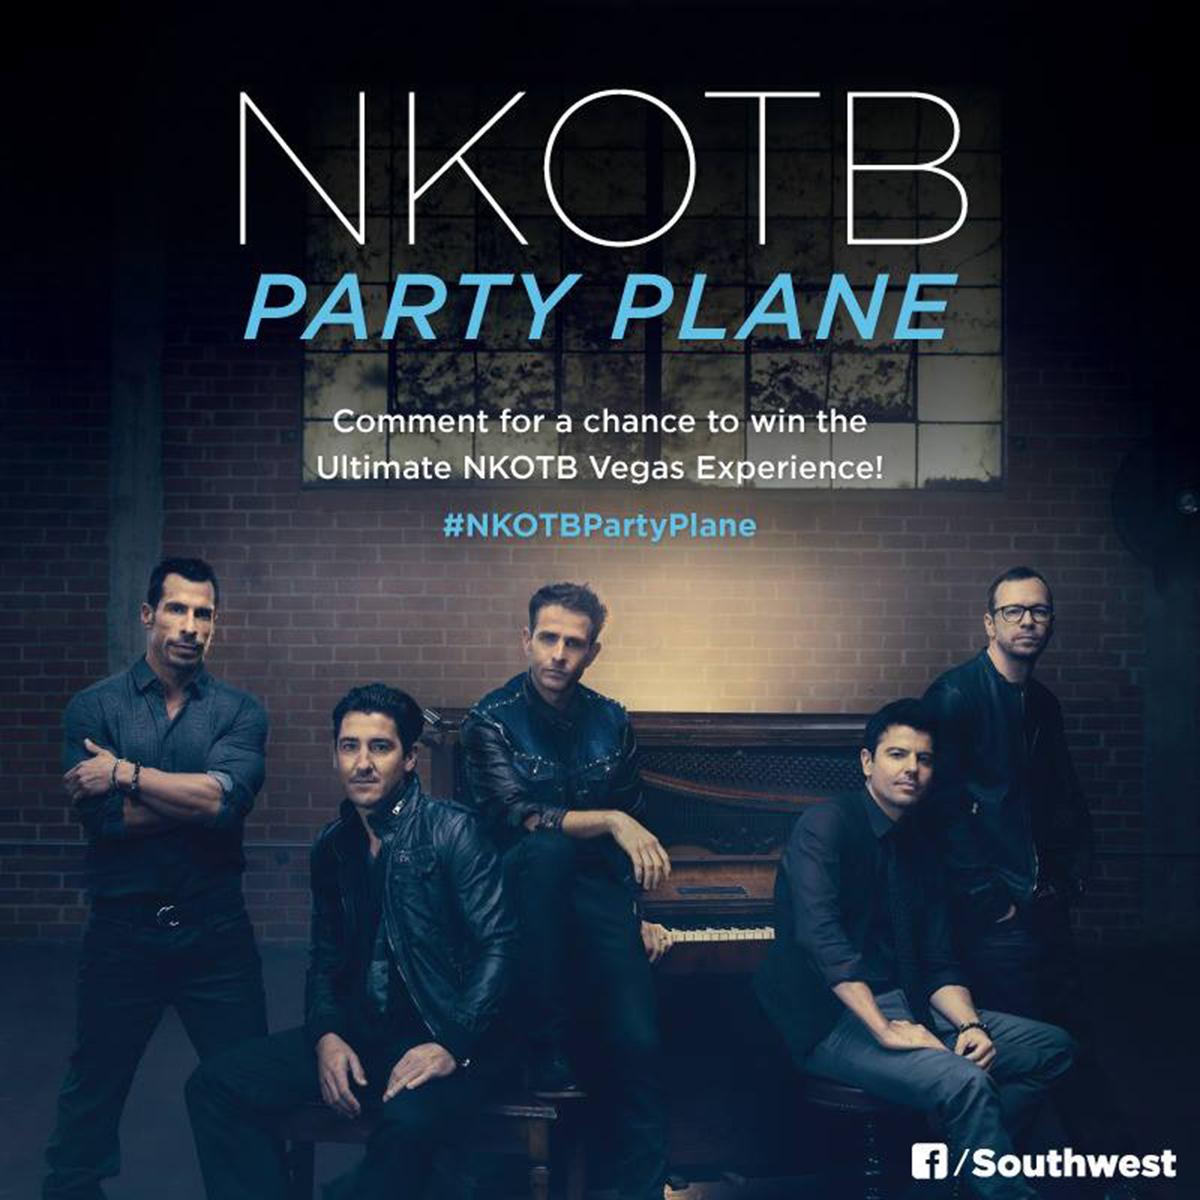 nkotb party plane